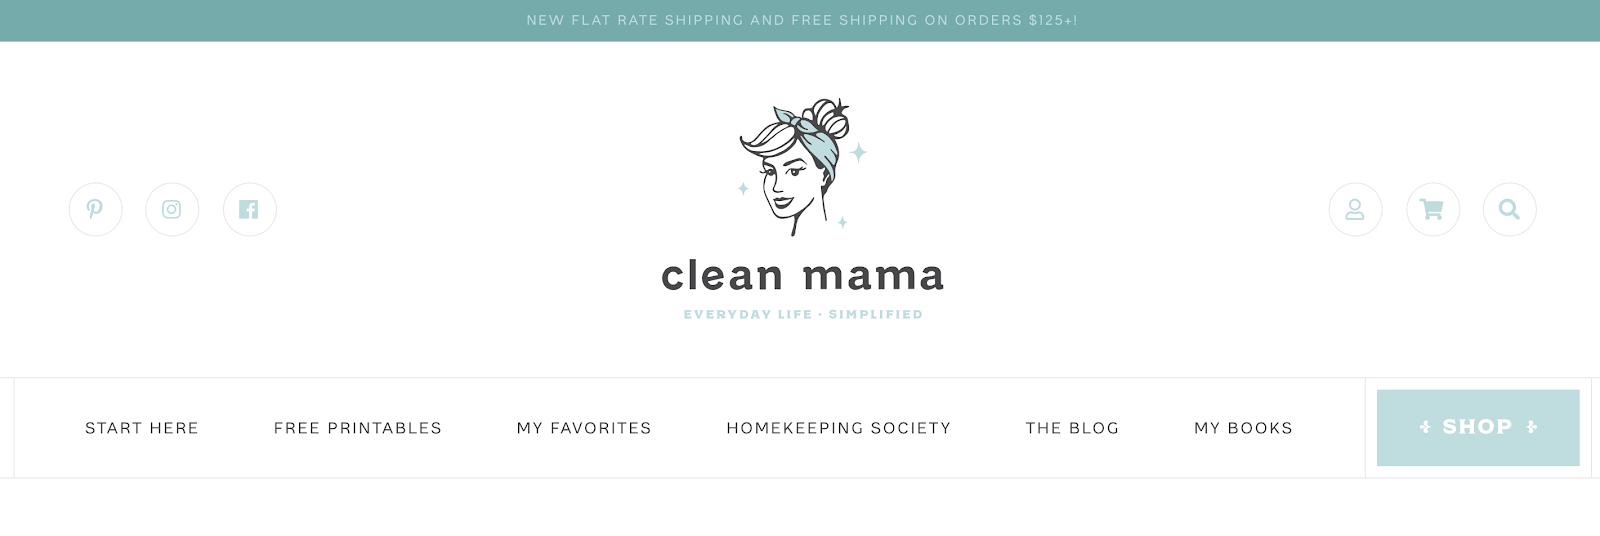 Clean Mama Homepage Screenshot (Menu Example)